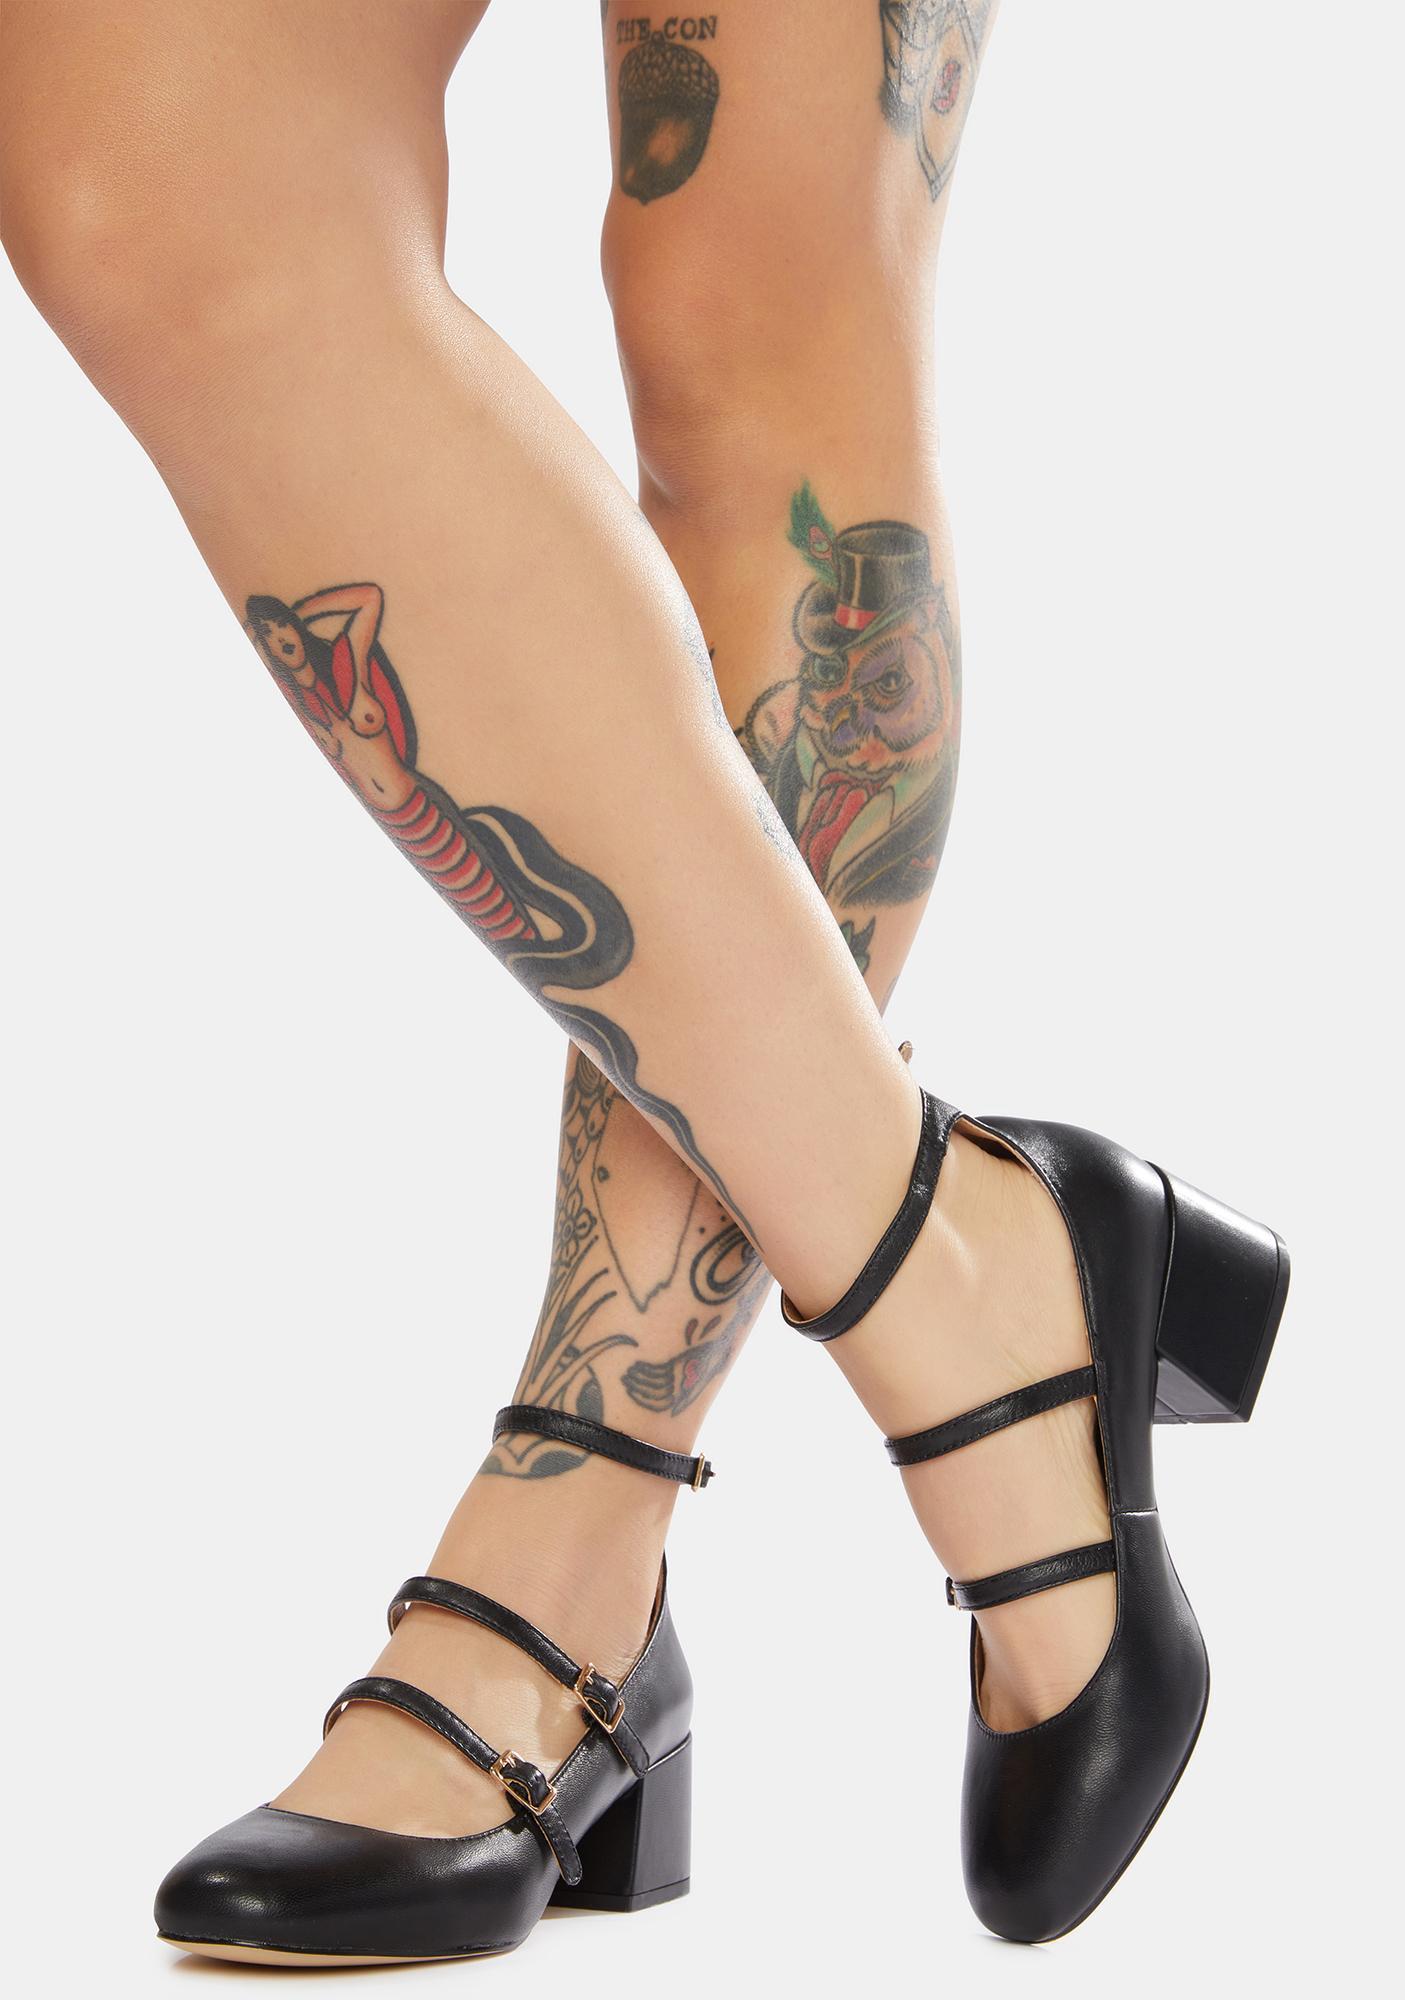 Chinese Laundry Moto Leather Heels